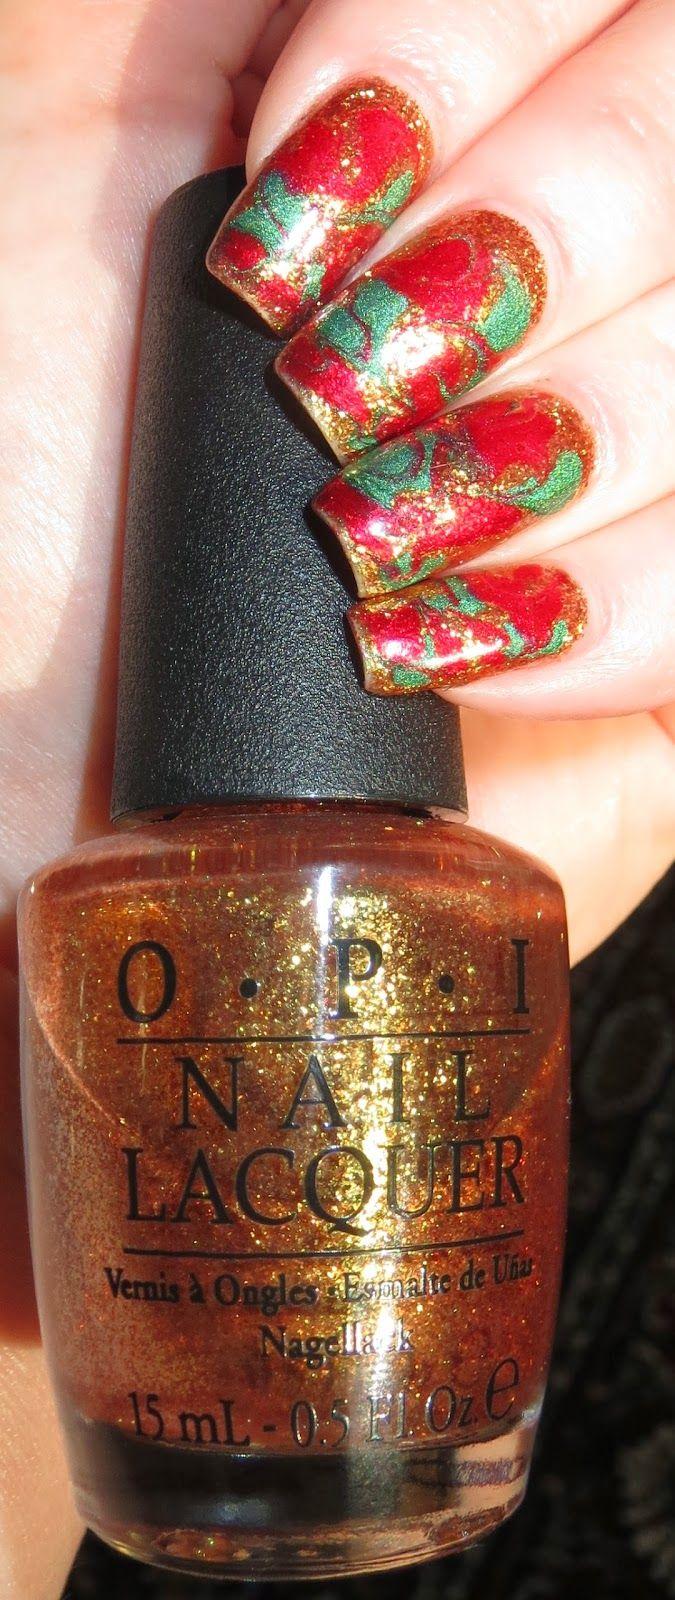 Christmas Dry Marble Nail Art #NailArt #Christmas #Holidays #Nails #Manicure #OPI #MarbleNails #DryMarbleNails #Nubar #Reclaim #Goldeneye #SephoraByOPI #SampleSale #DottingTool #Festive #EasyNailArt